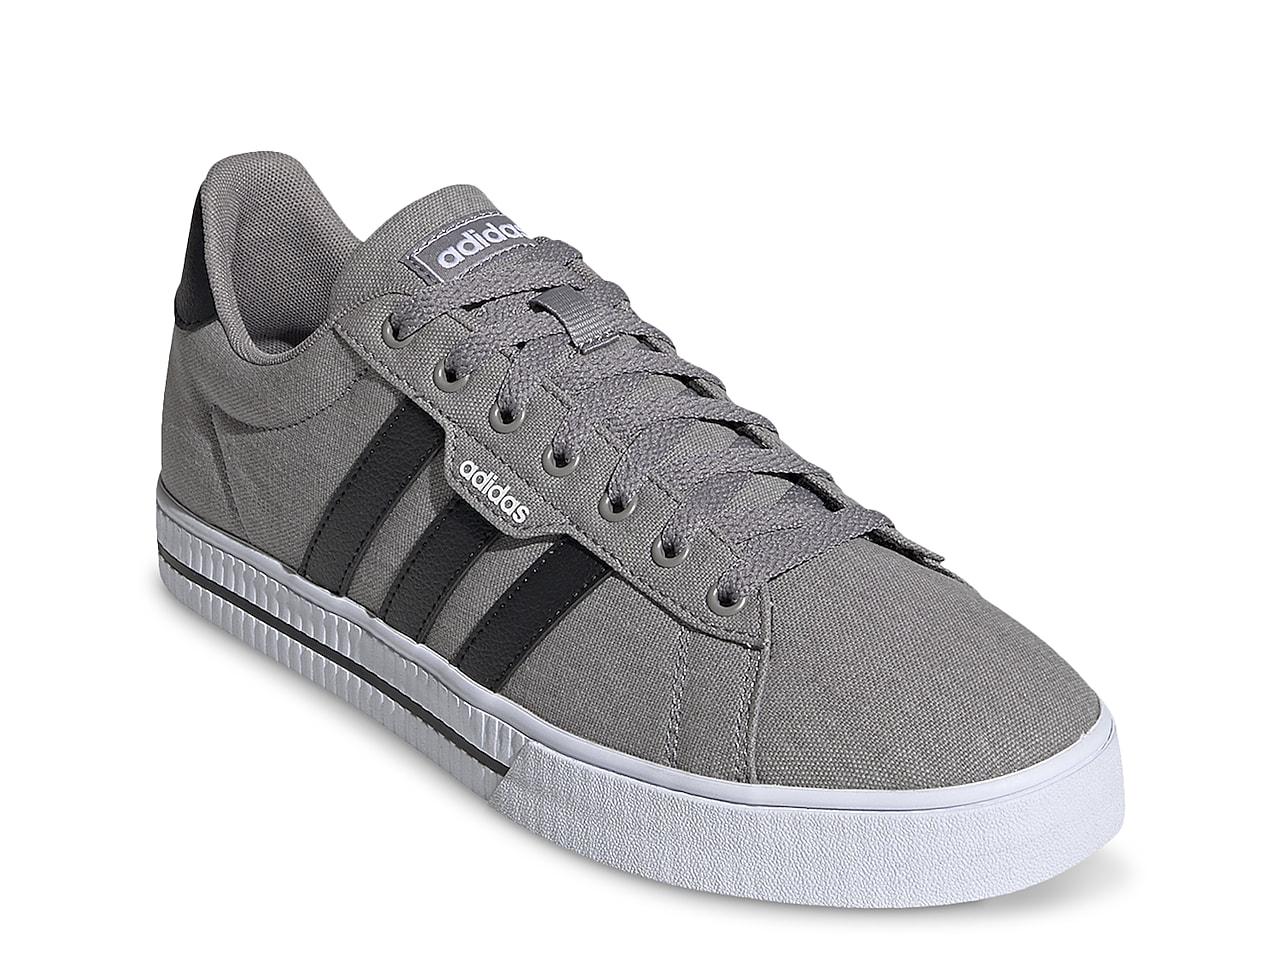 adidas Daily 3.0 Sneaker - Men's